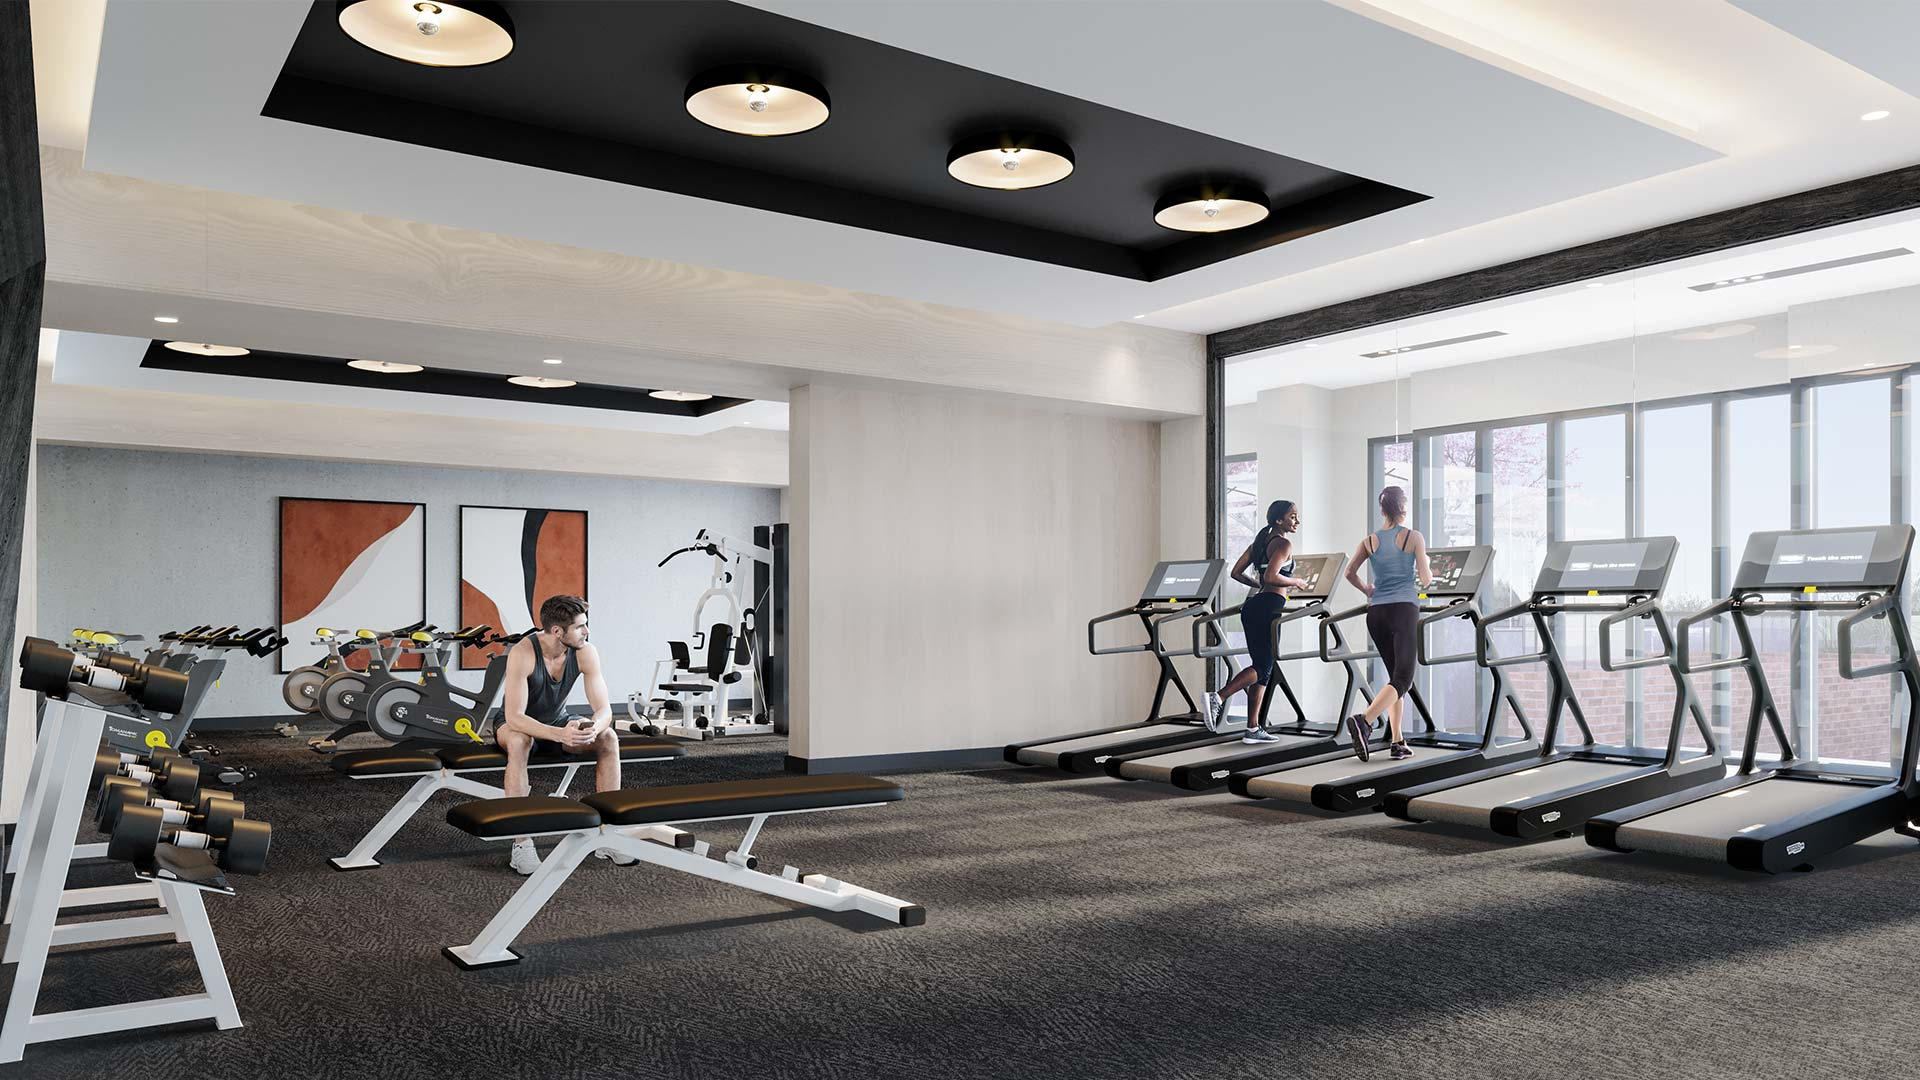 This Toronto condo features gym and yoga studio